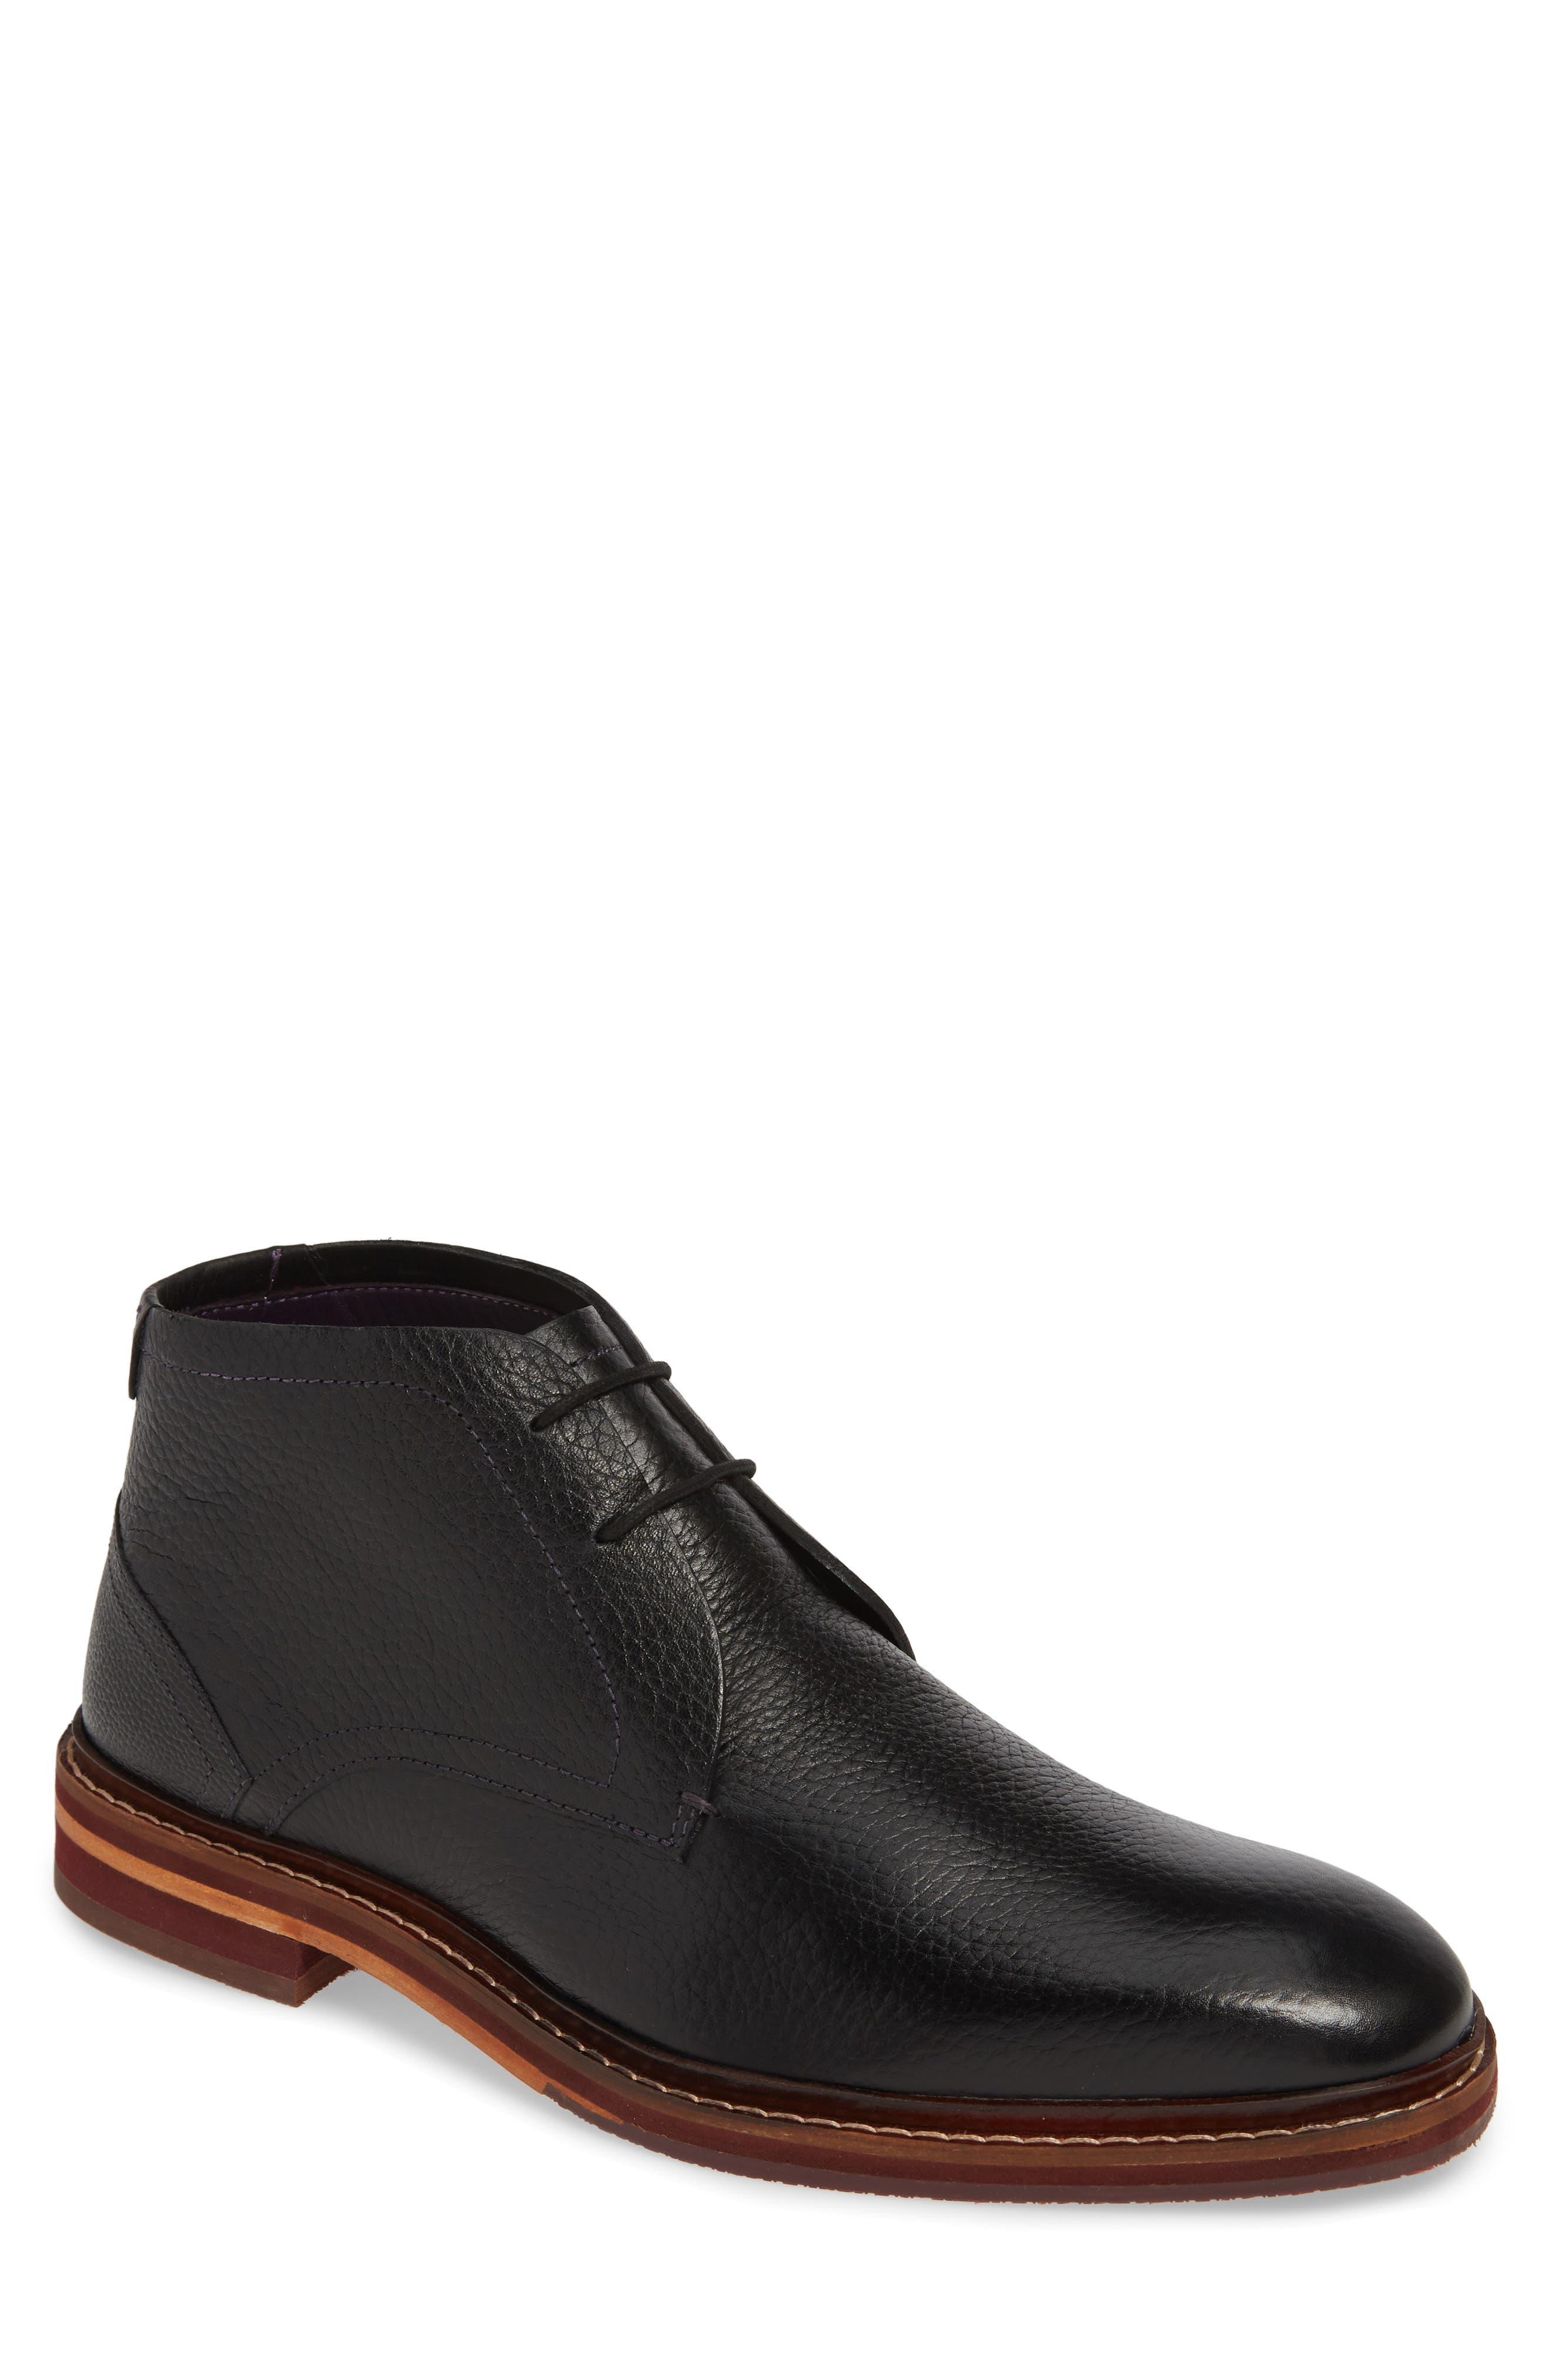 Ted Baker London Corans Chukka Boot, Black